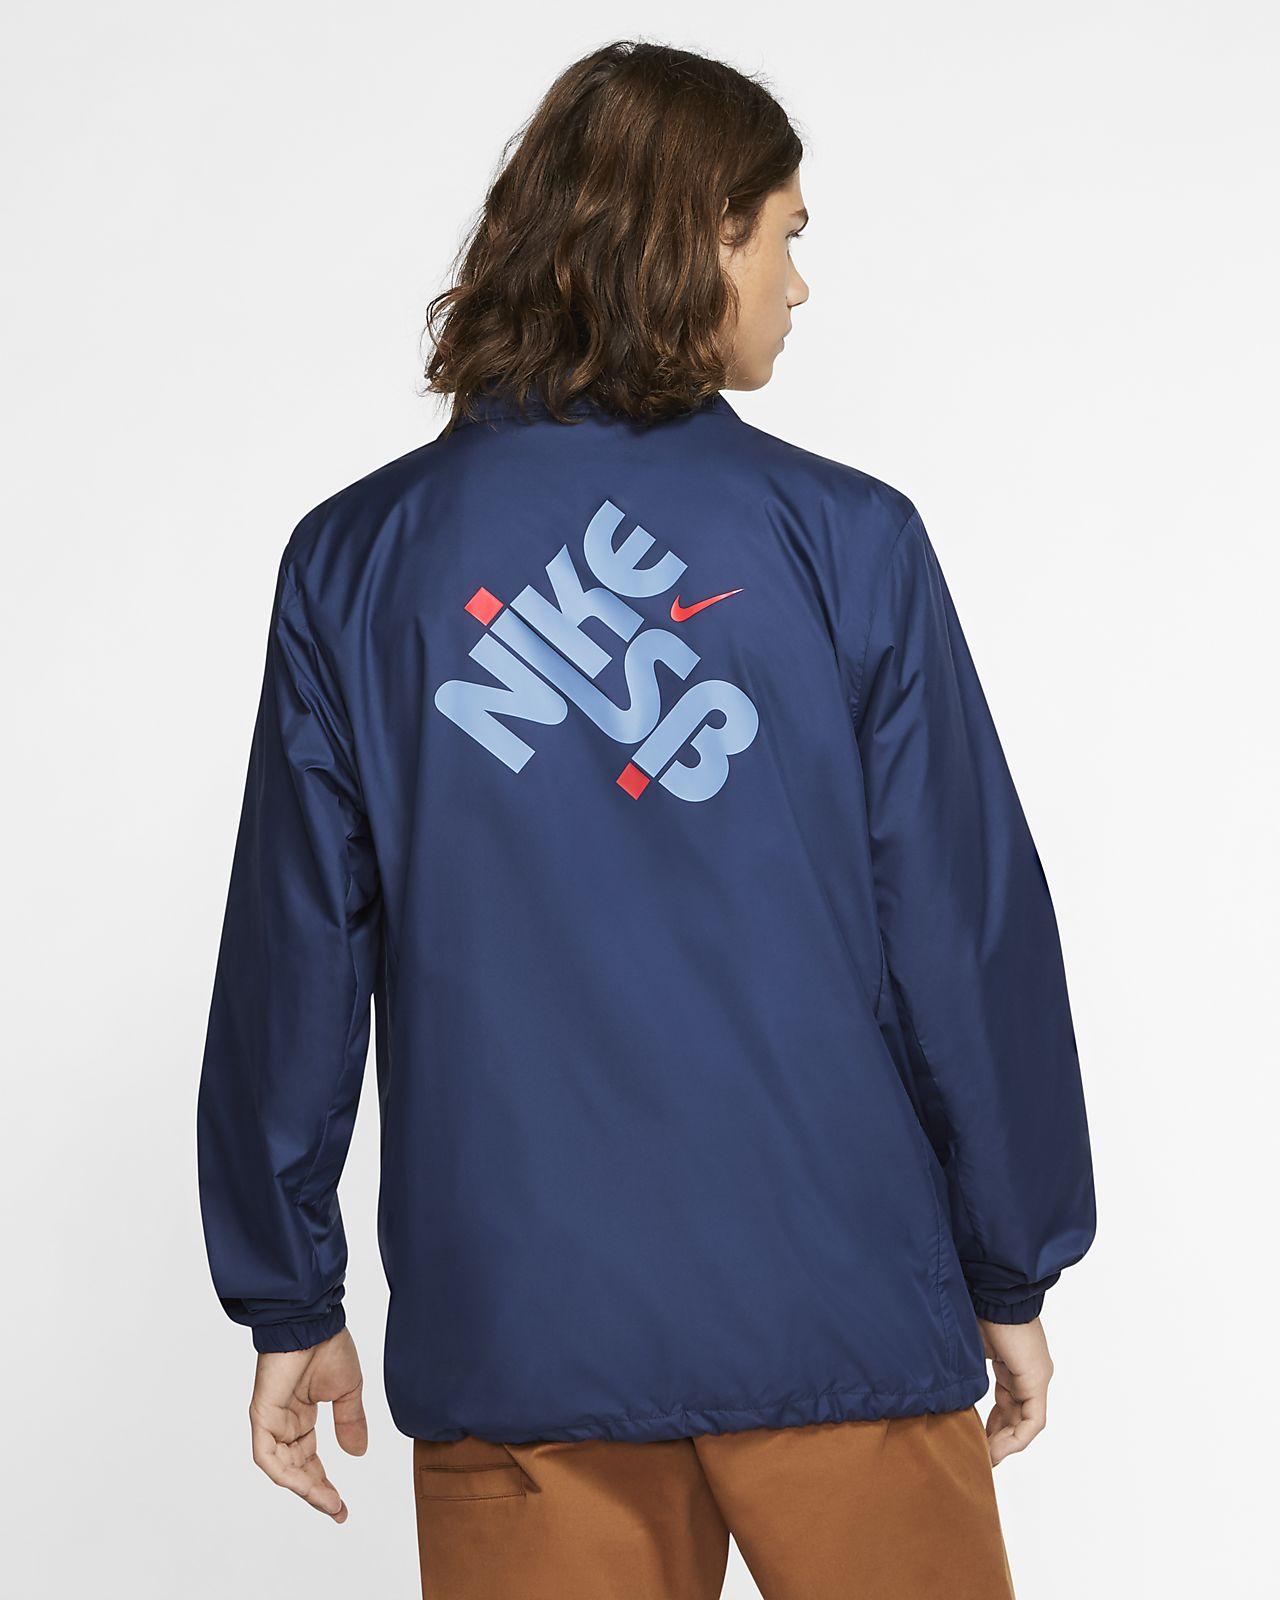 NIKE SB SHIELD COACHES ICON JACKET | Suburbana Store